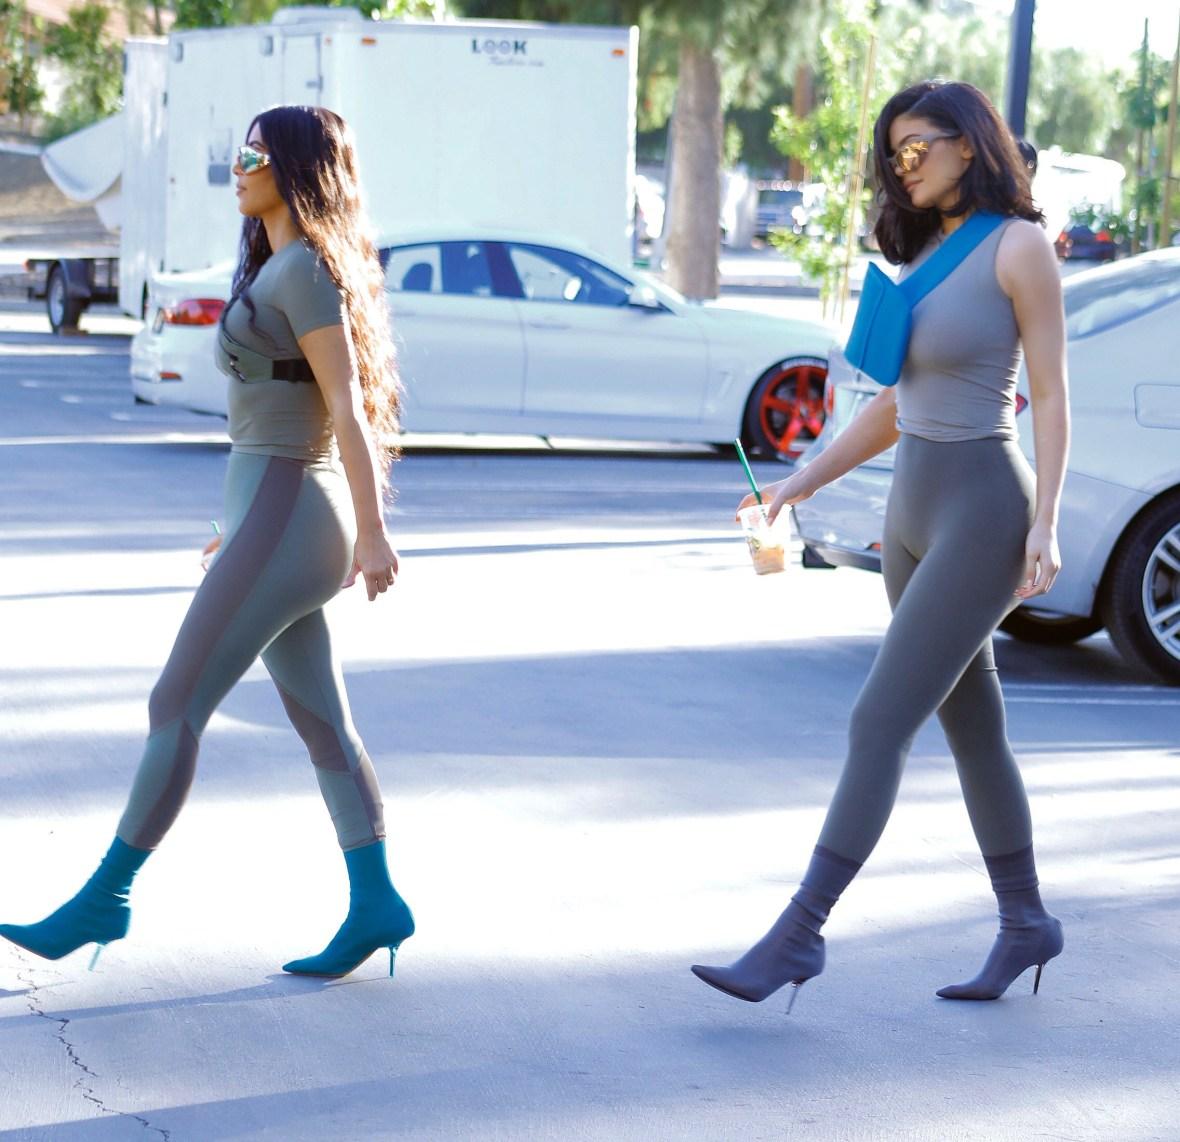 kim kardashian kylie jenner matching outfits splash